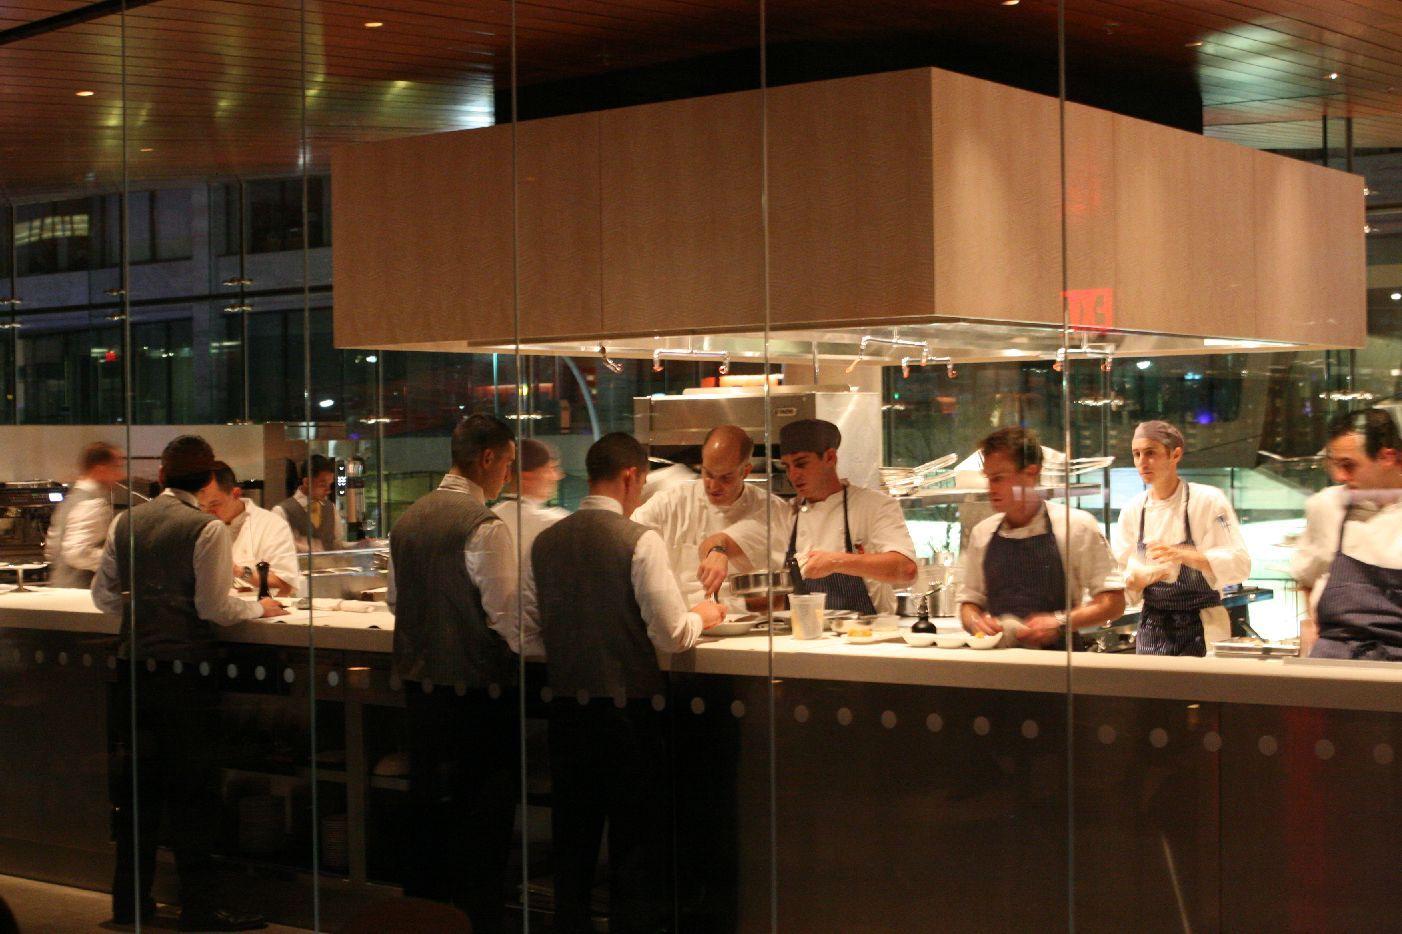 Semi Open Kitchen Service Area Glass Partitions Kitchen Design Open